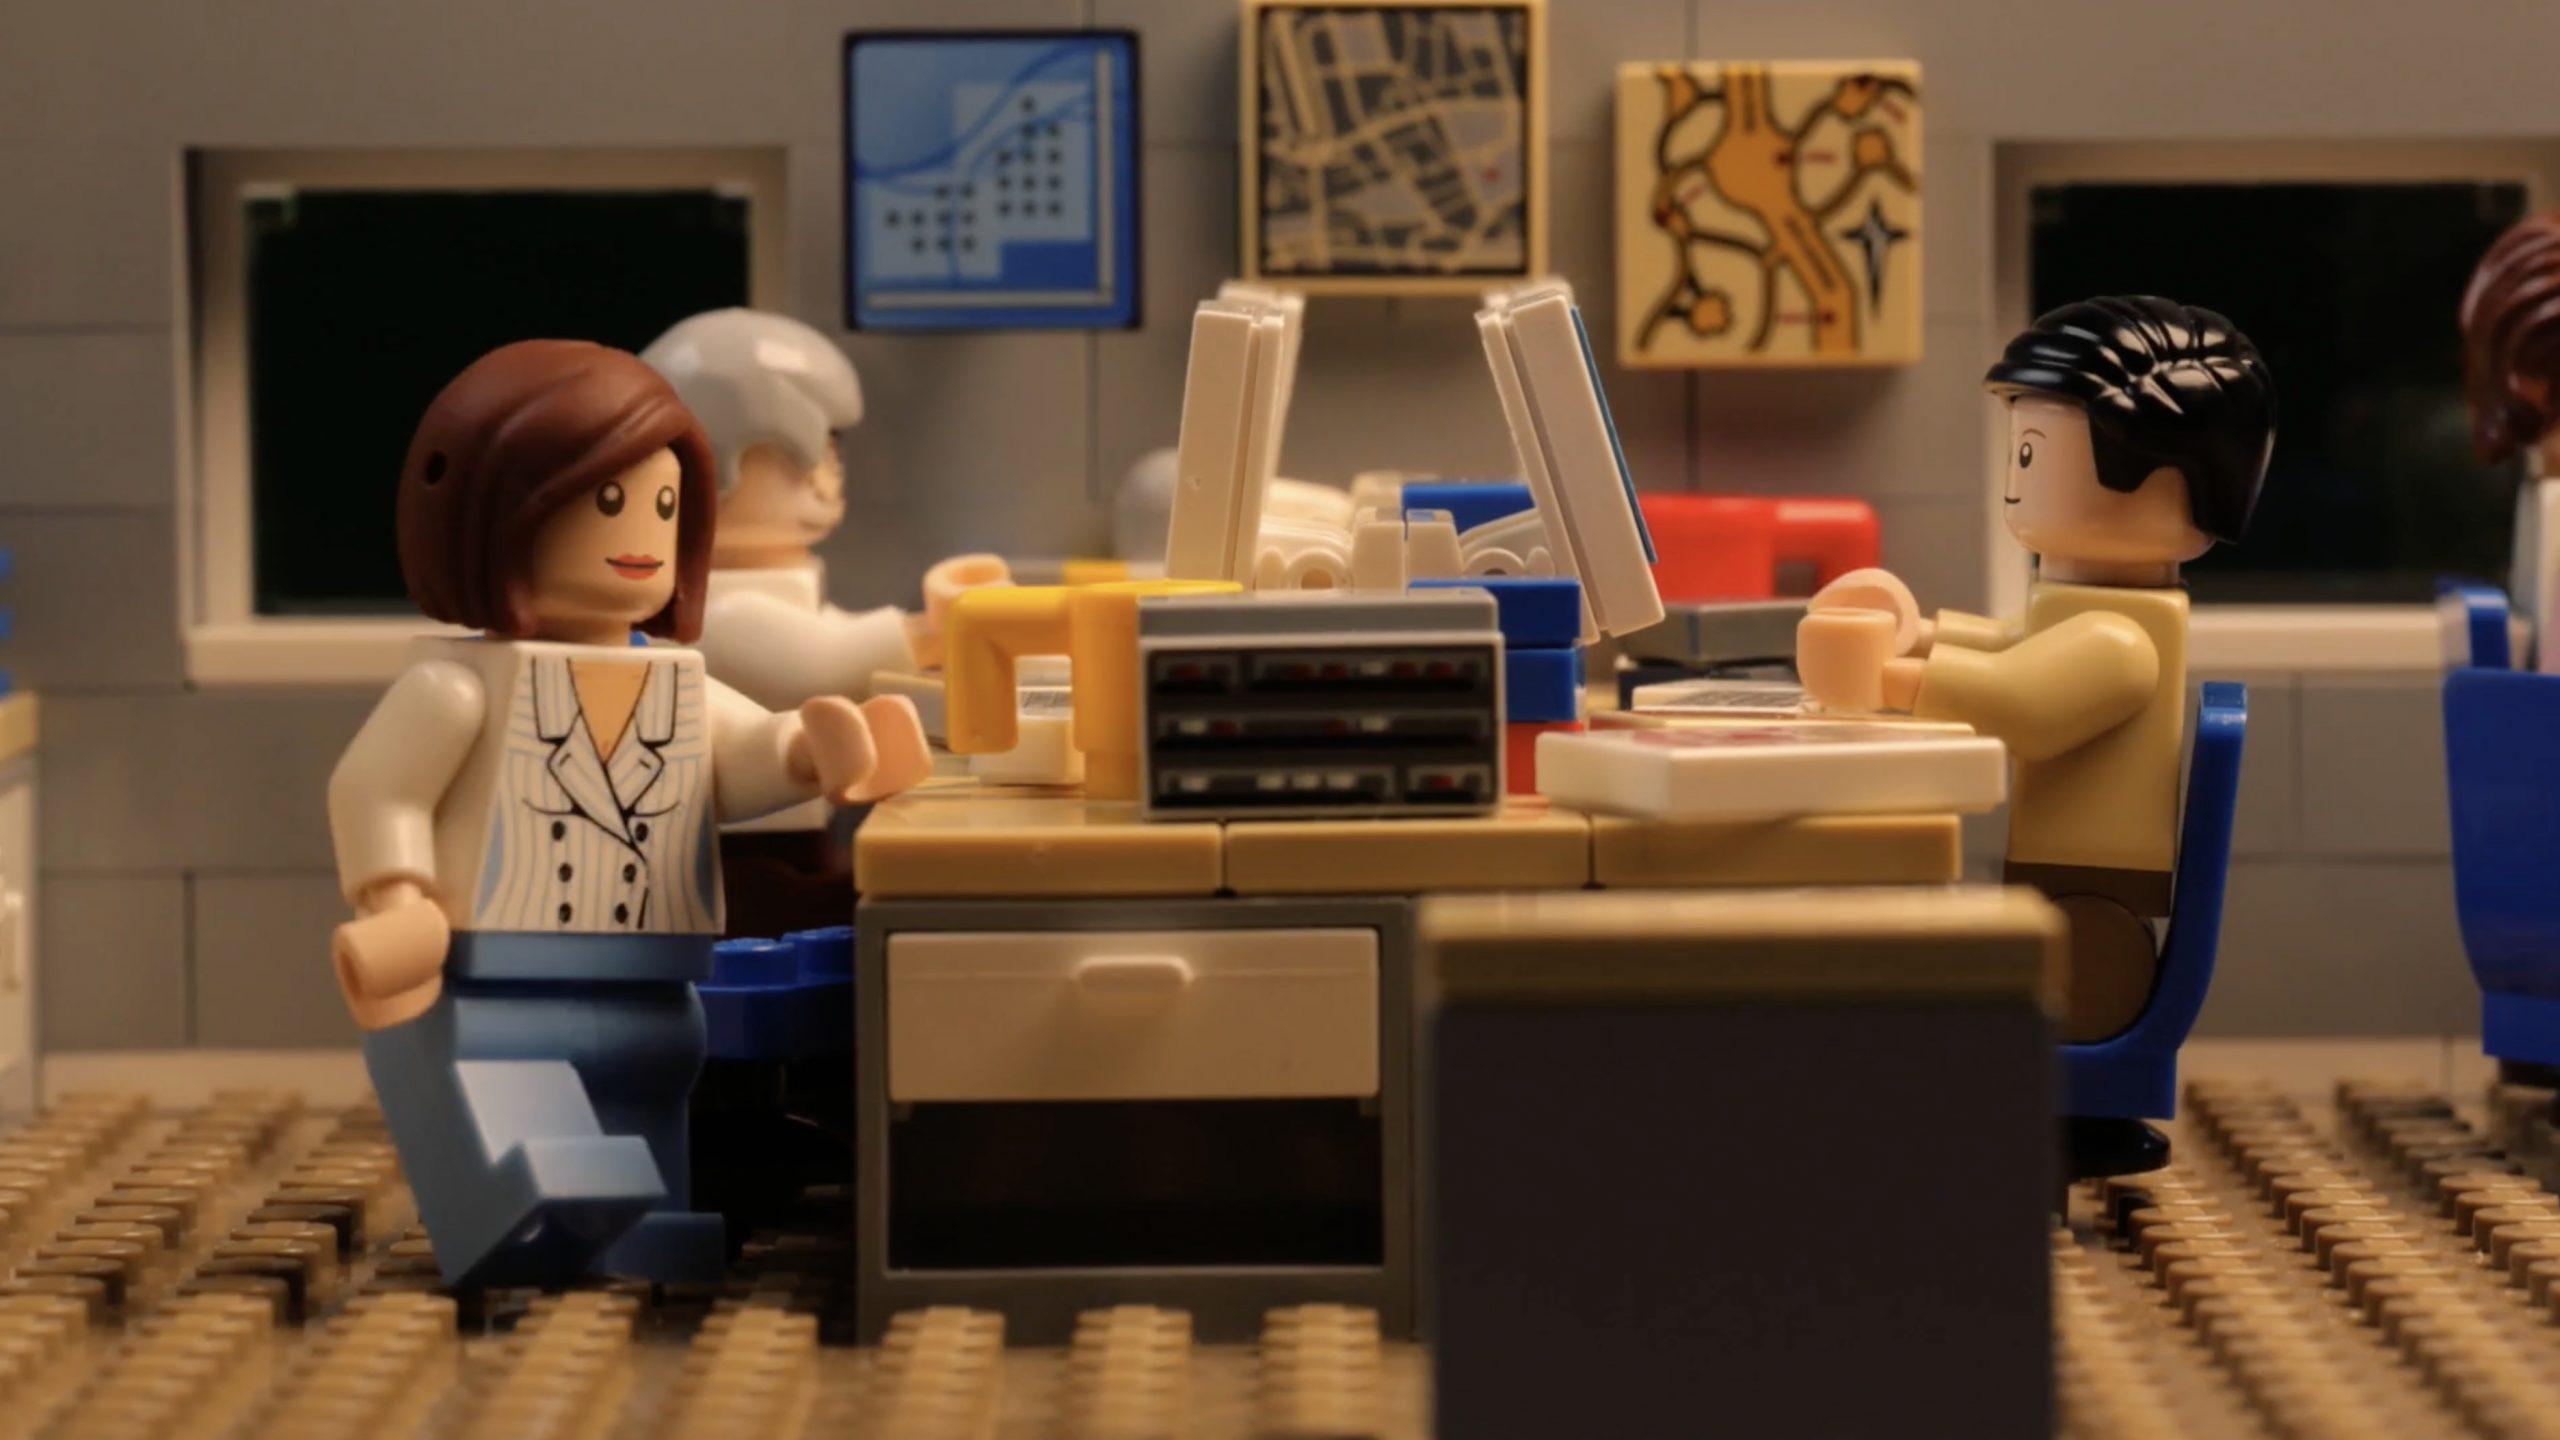 Lego stop motion animated video still